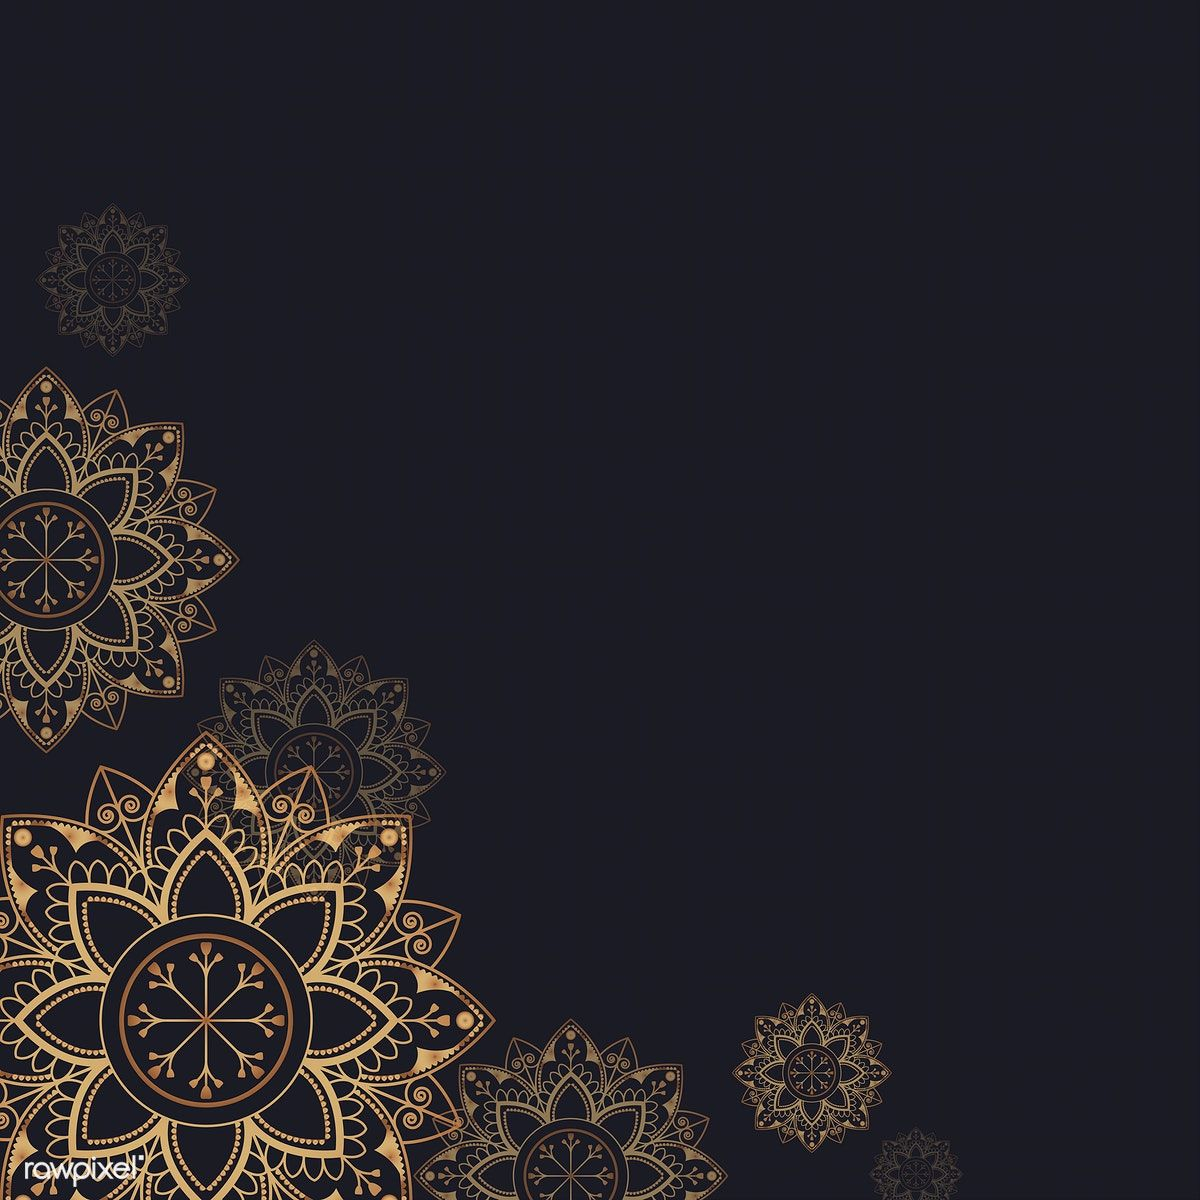 Download premium vector of Gold mandala pattern on black 1200x1200